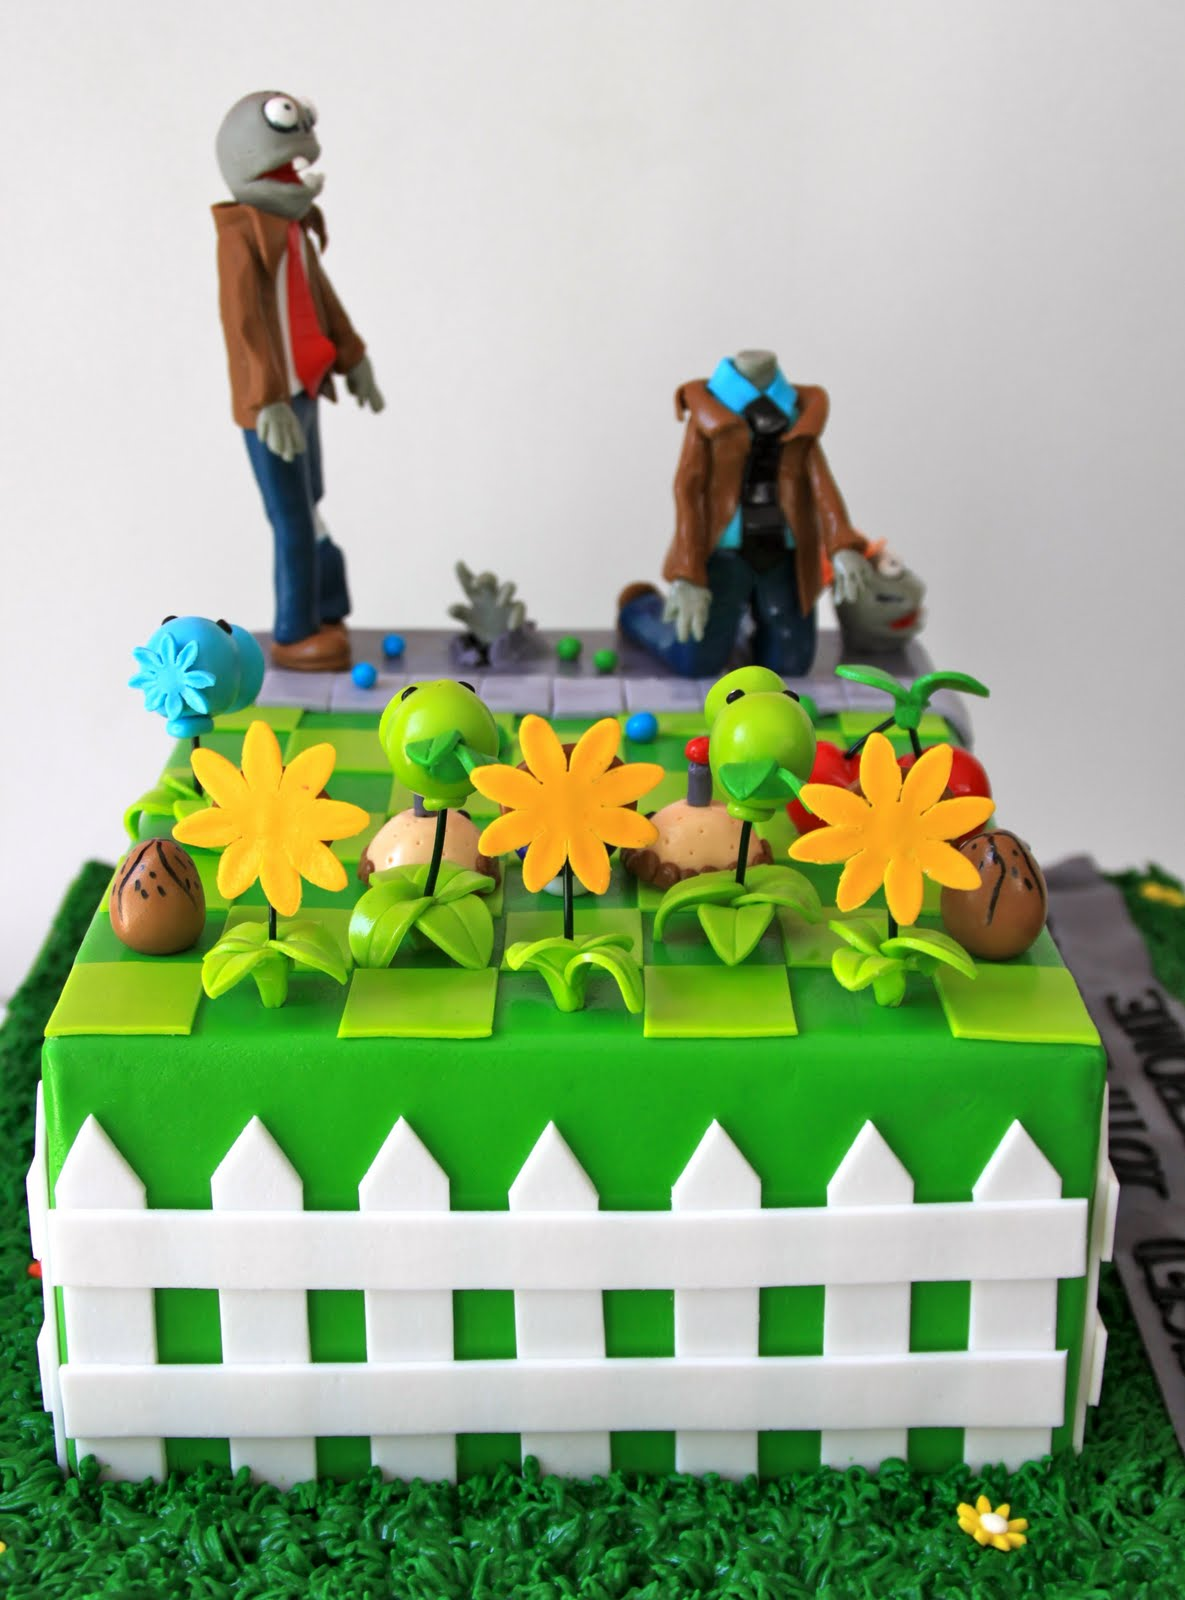 Celebrate With Cake Plants Vs Zombies Cake